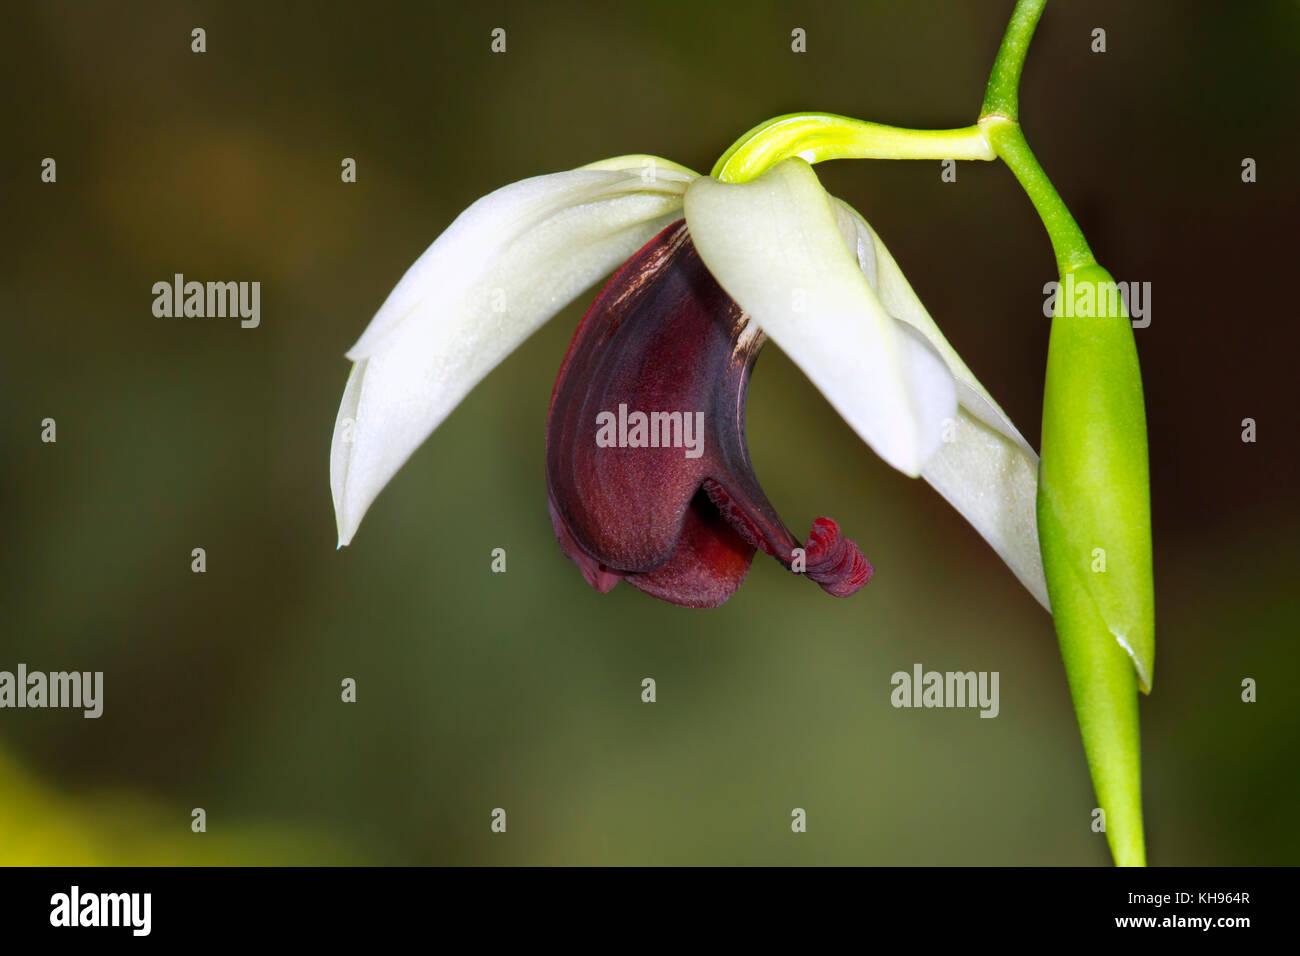 Coelogyne usitana is orchid native to the Philippine island of Mindanao - Stock Image